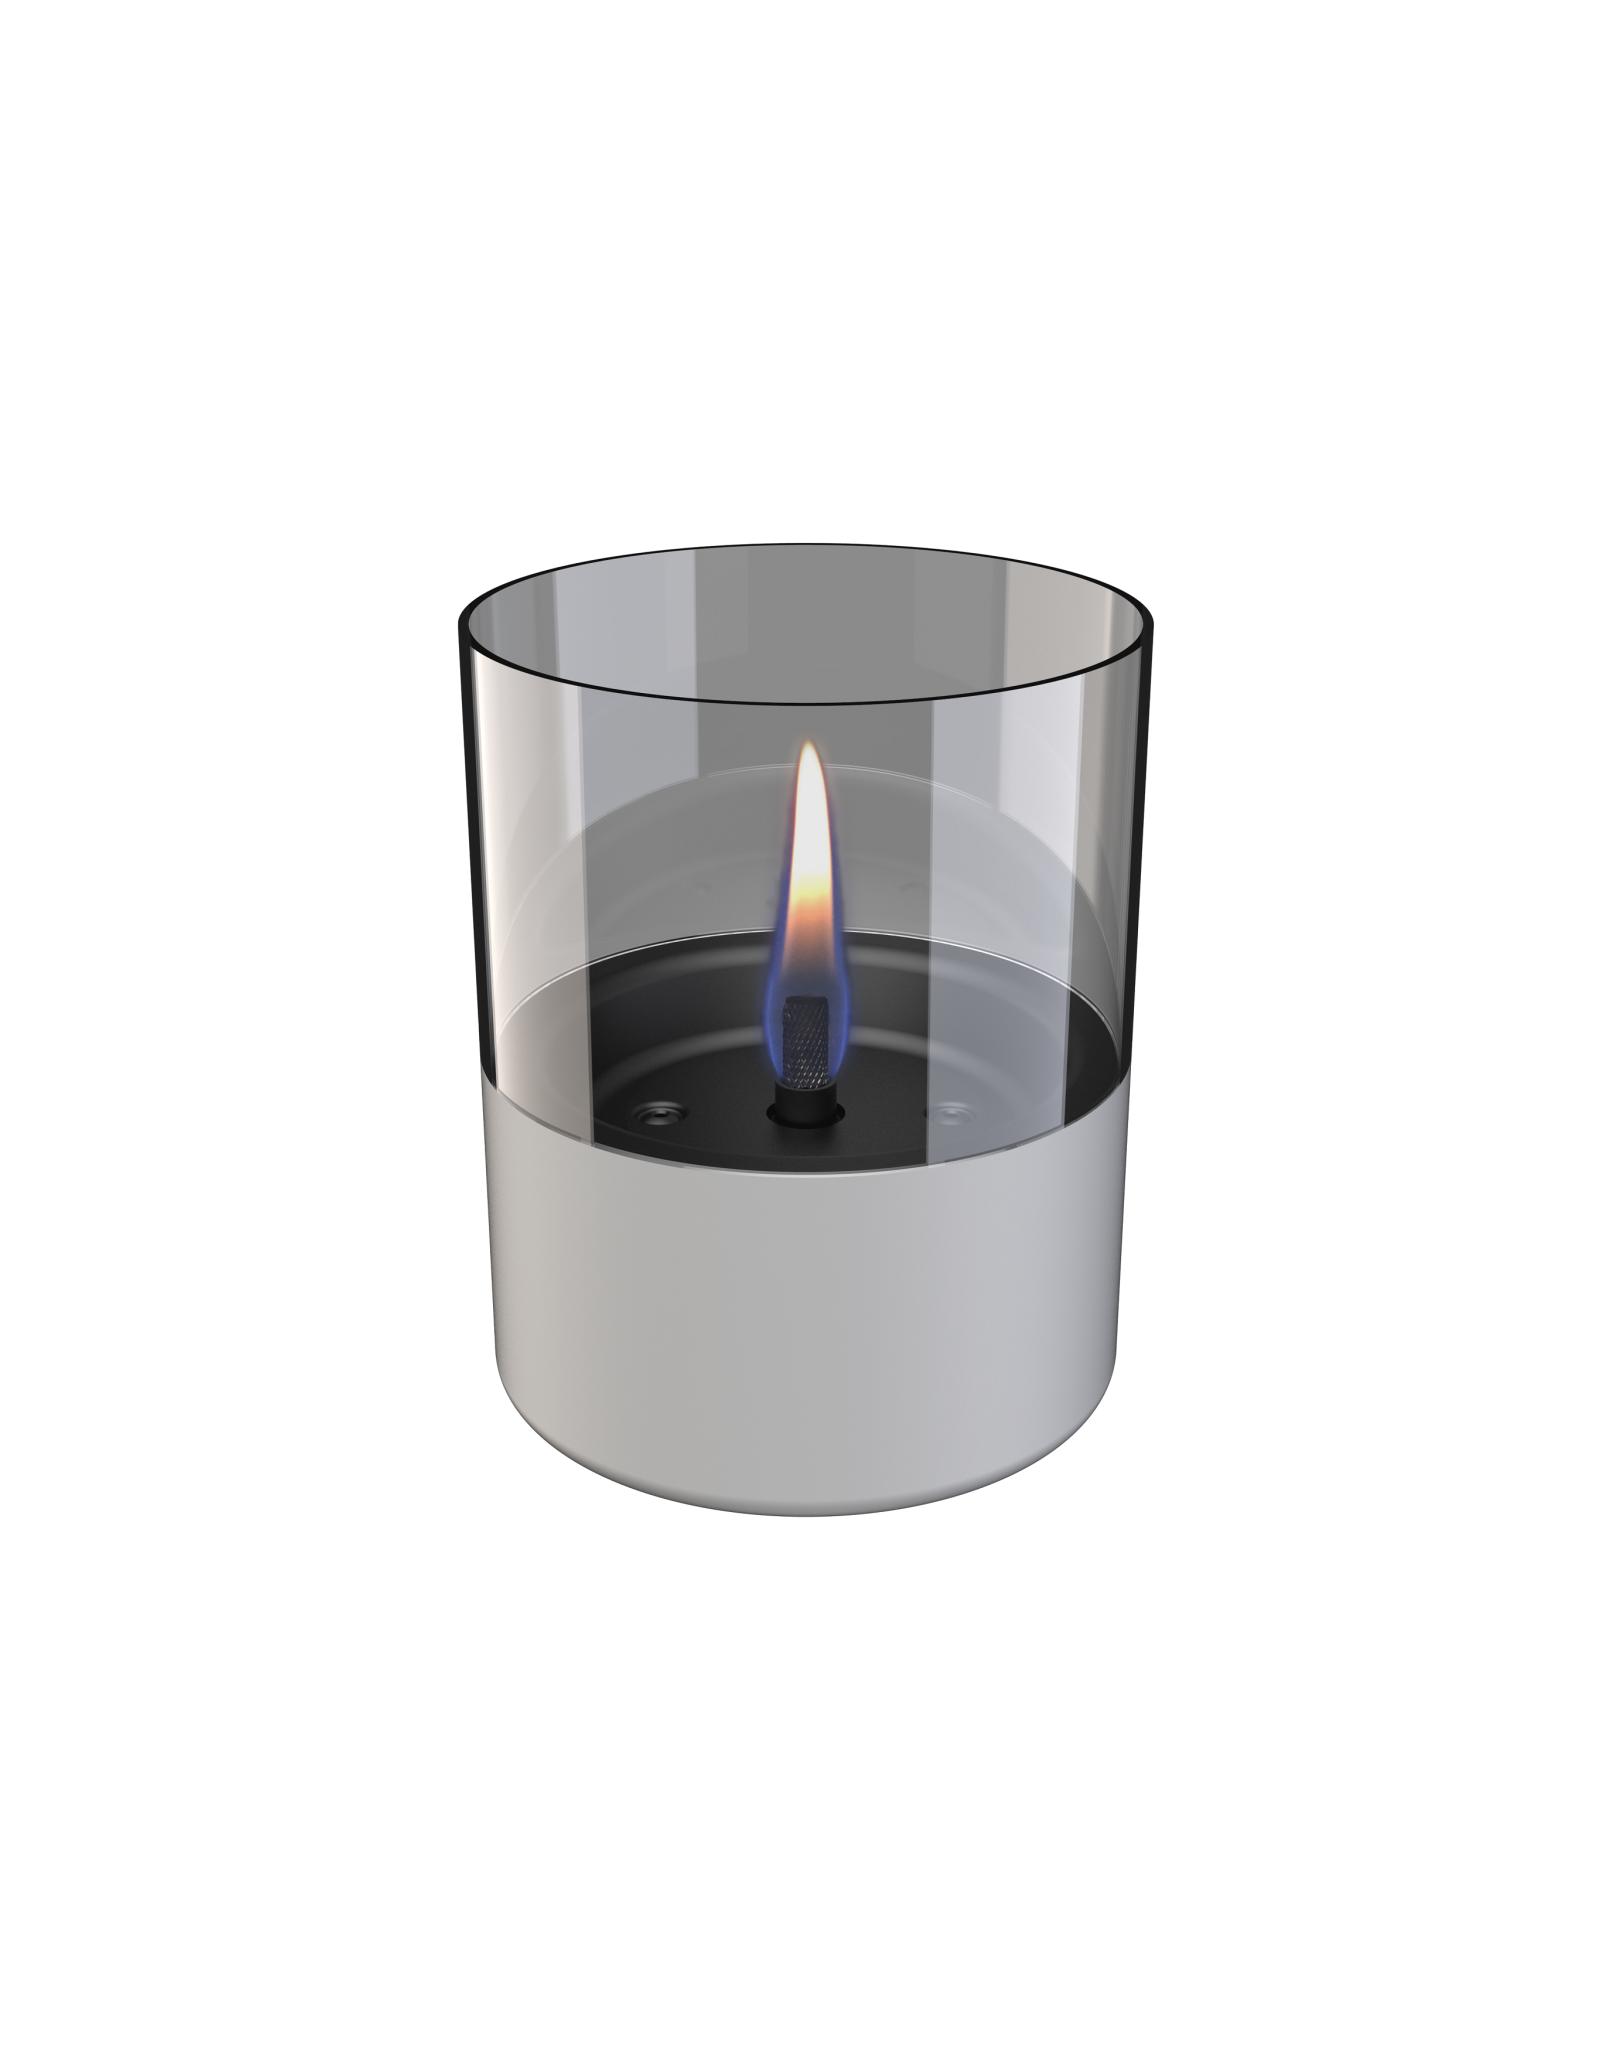 Tenderflame Lilly Glass licht grijs (tafelhaard) - Tenderflame